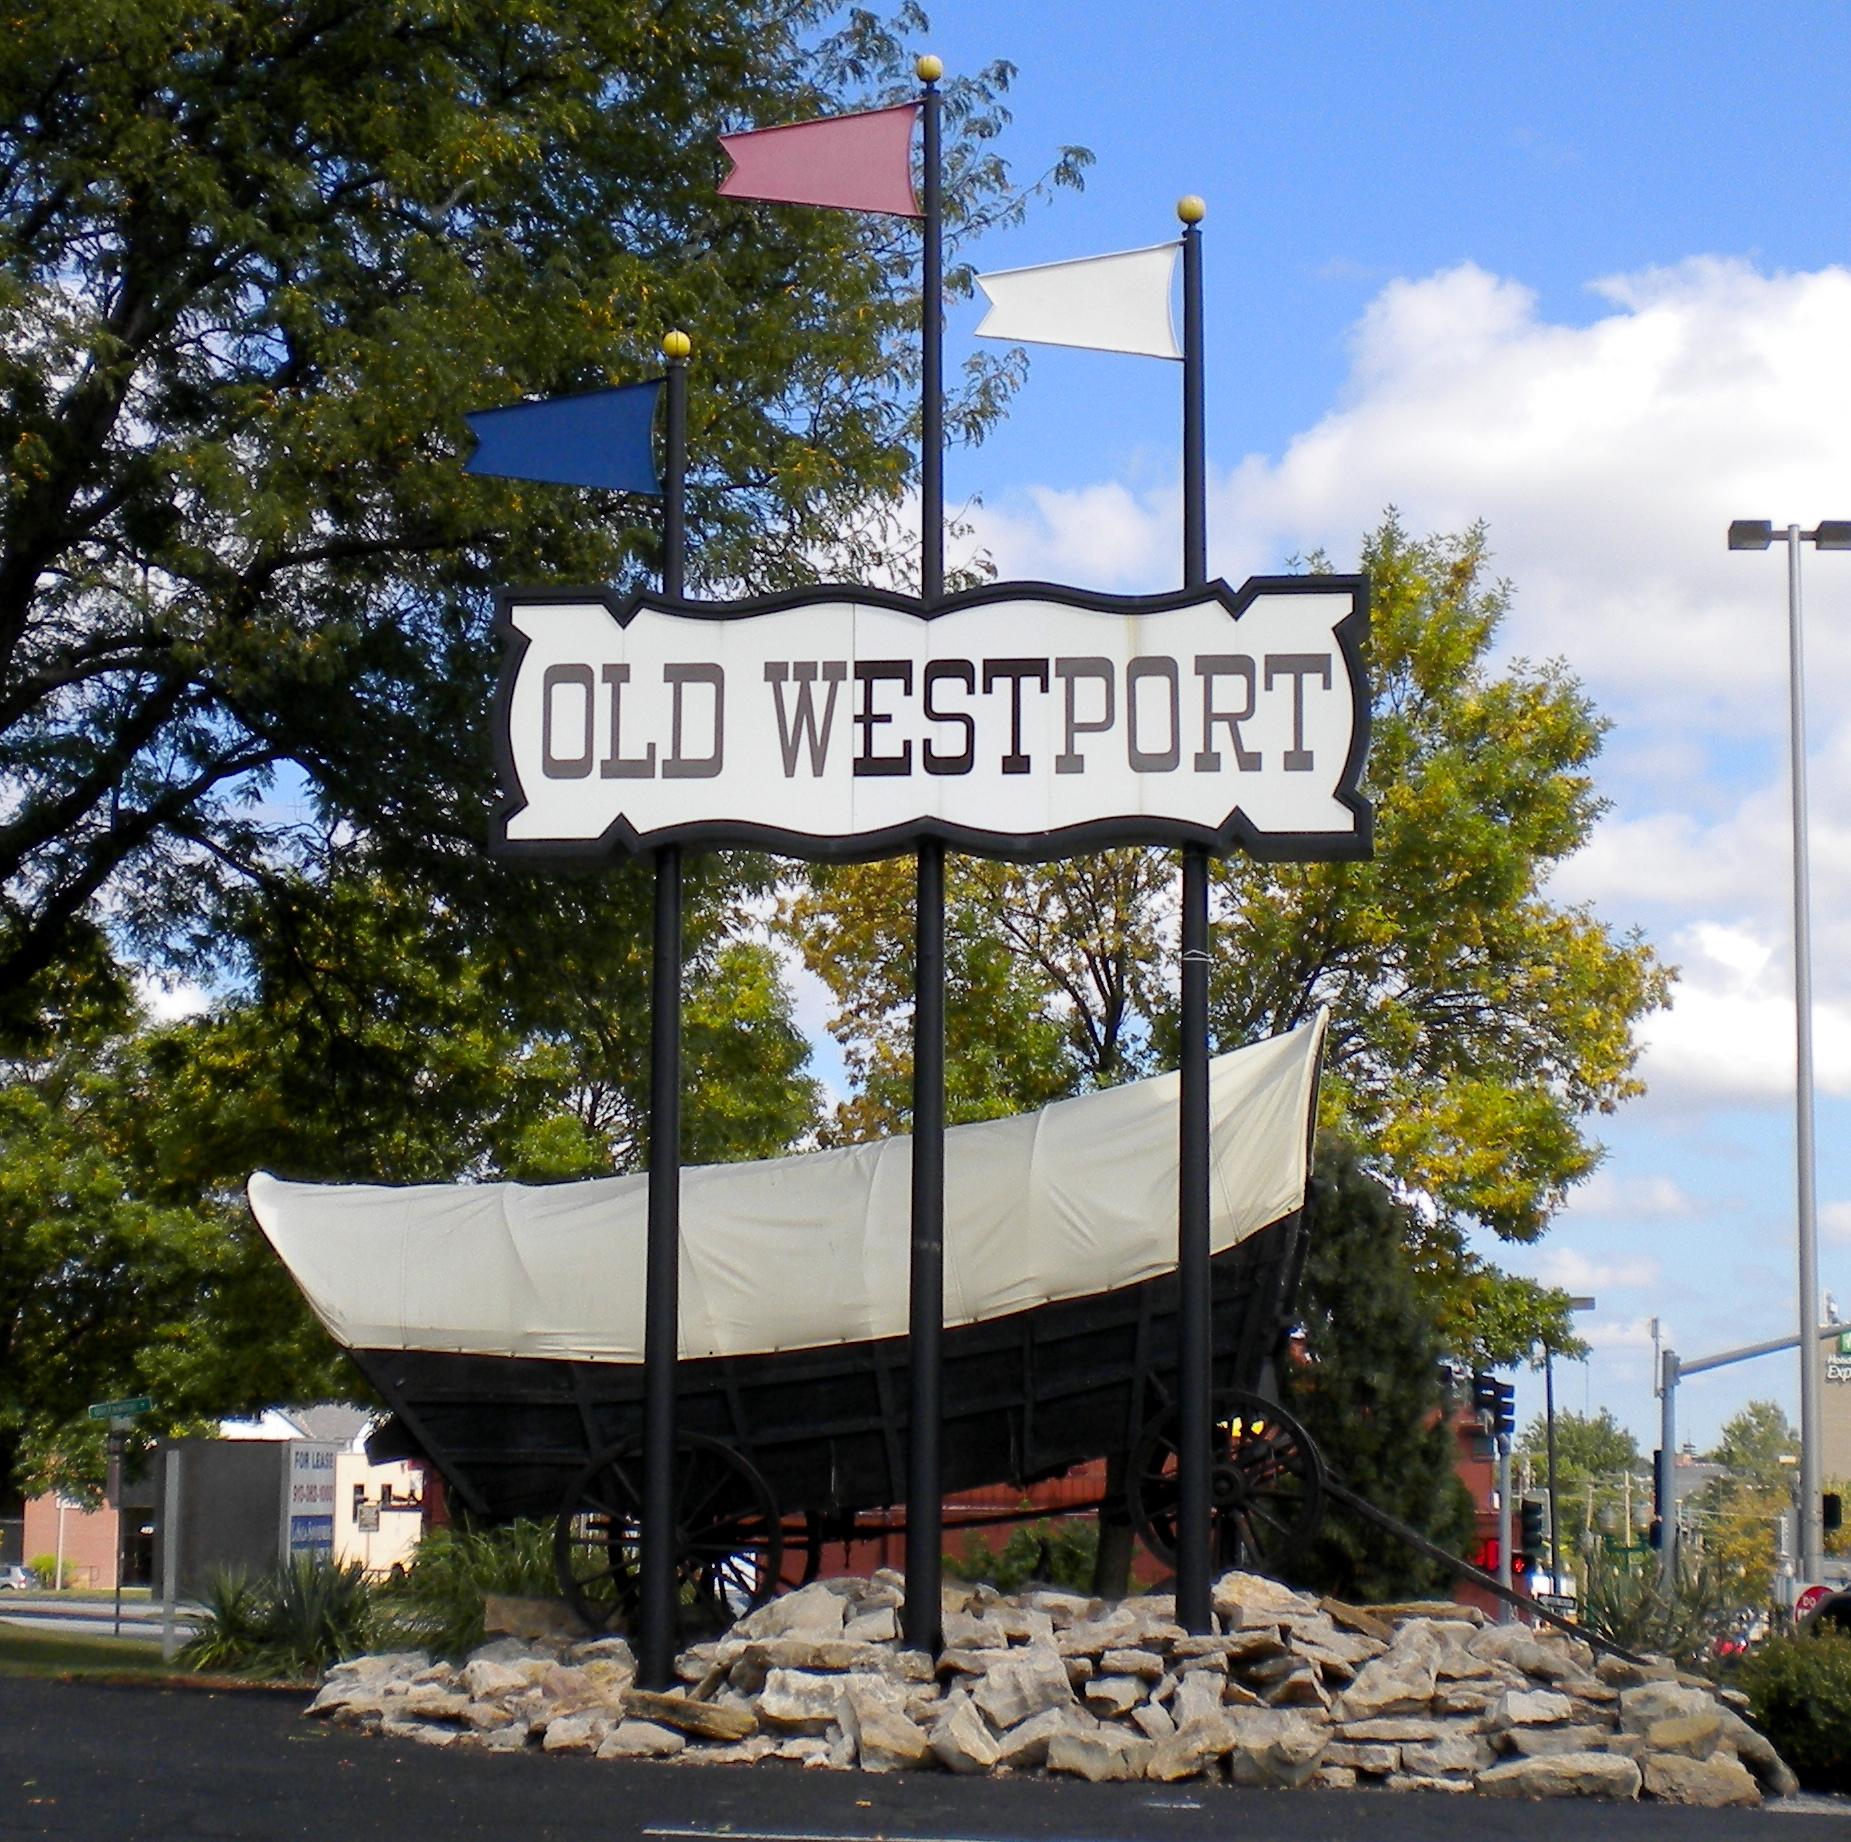 Westport kansas city missouri wikipedia for The westport